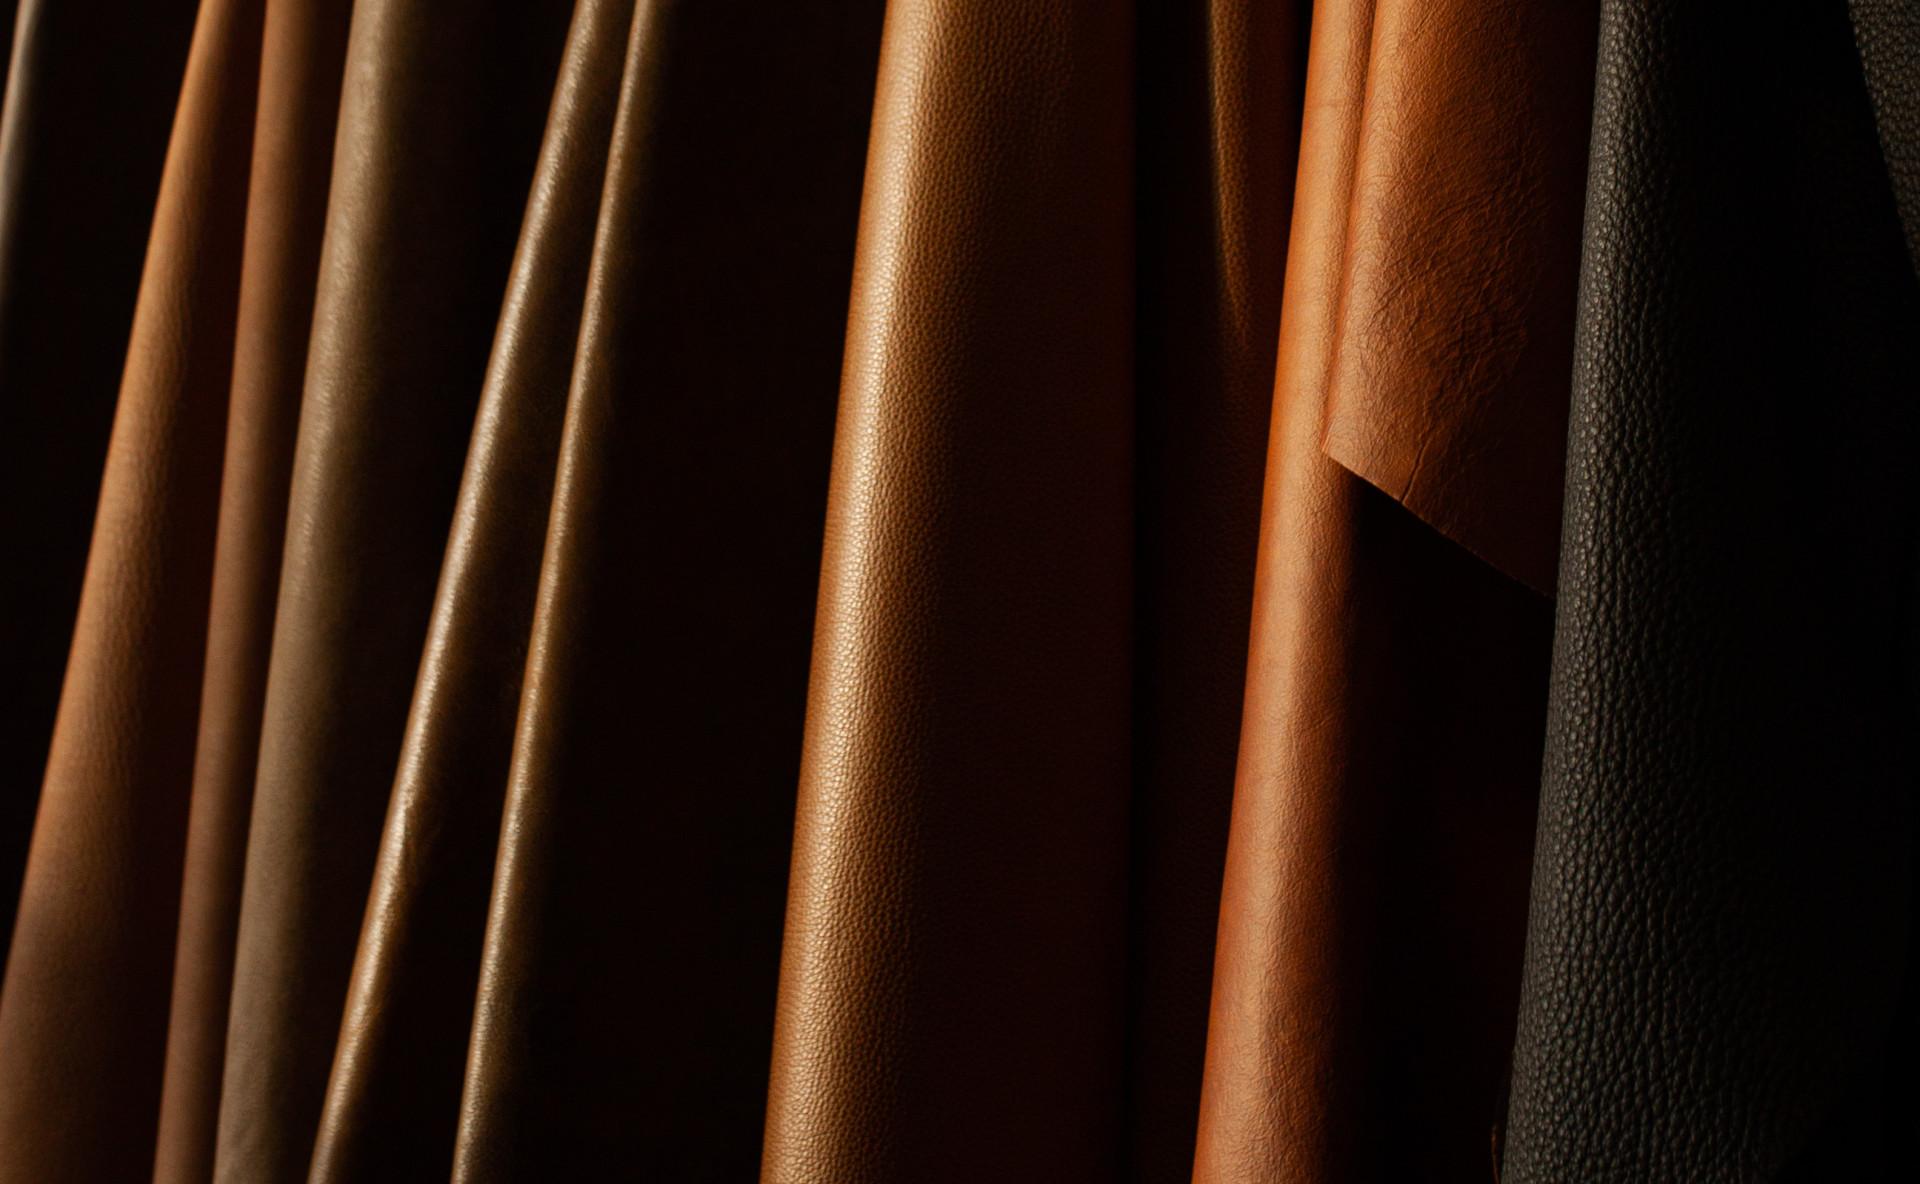 Finest Italian leather